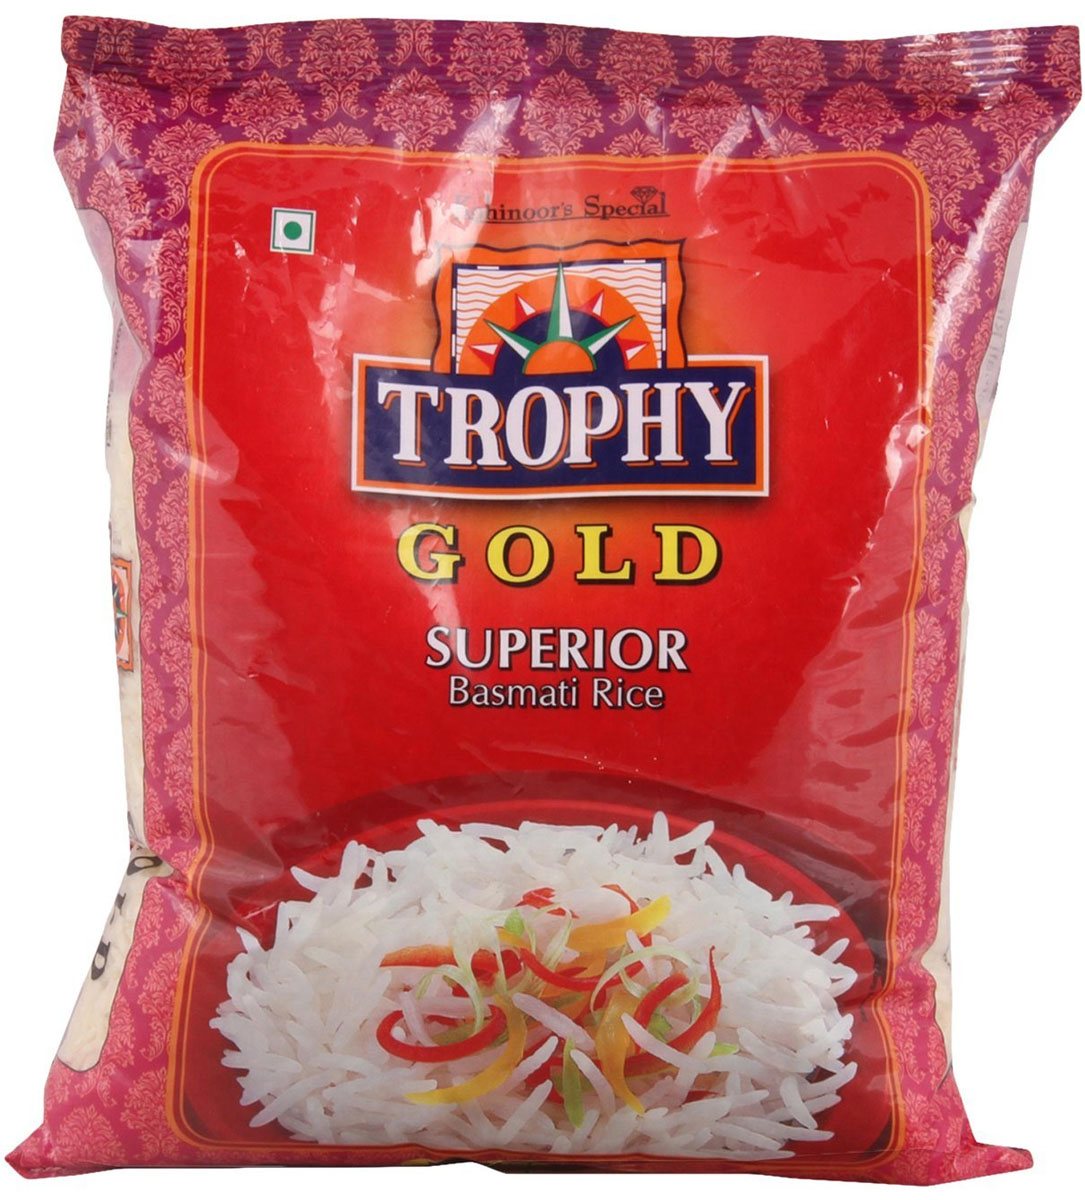 Kohinoor трофей басмати, 1 кг рис националь золотистый 900г